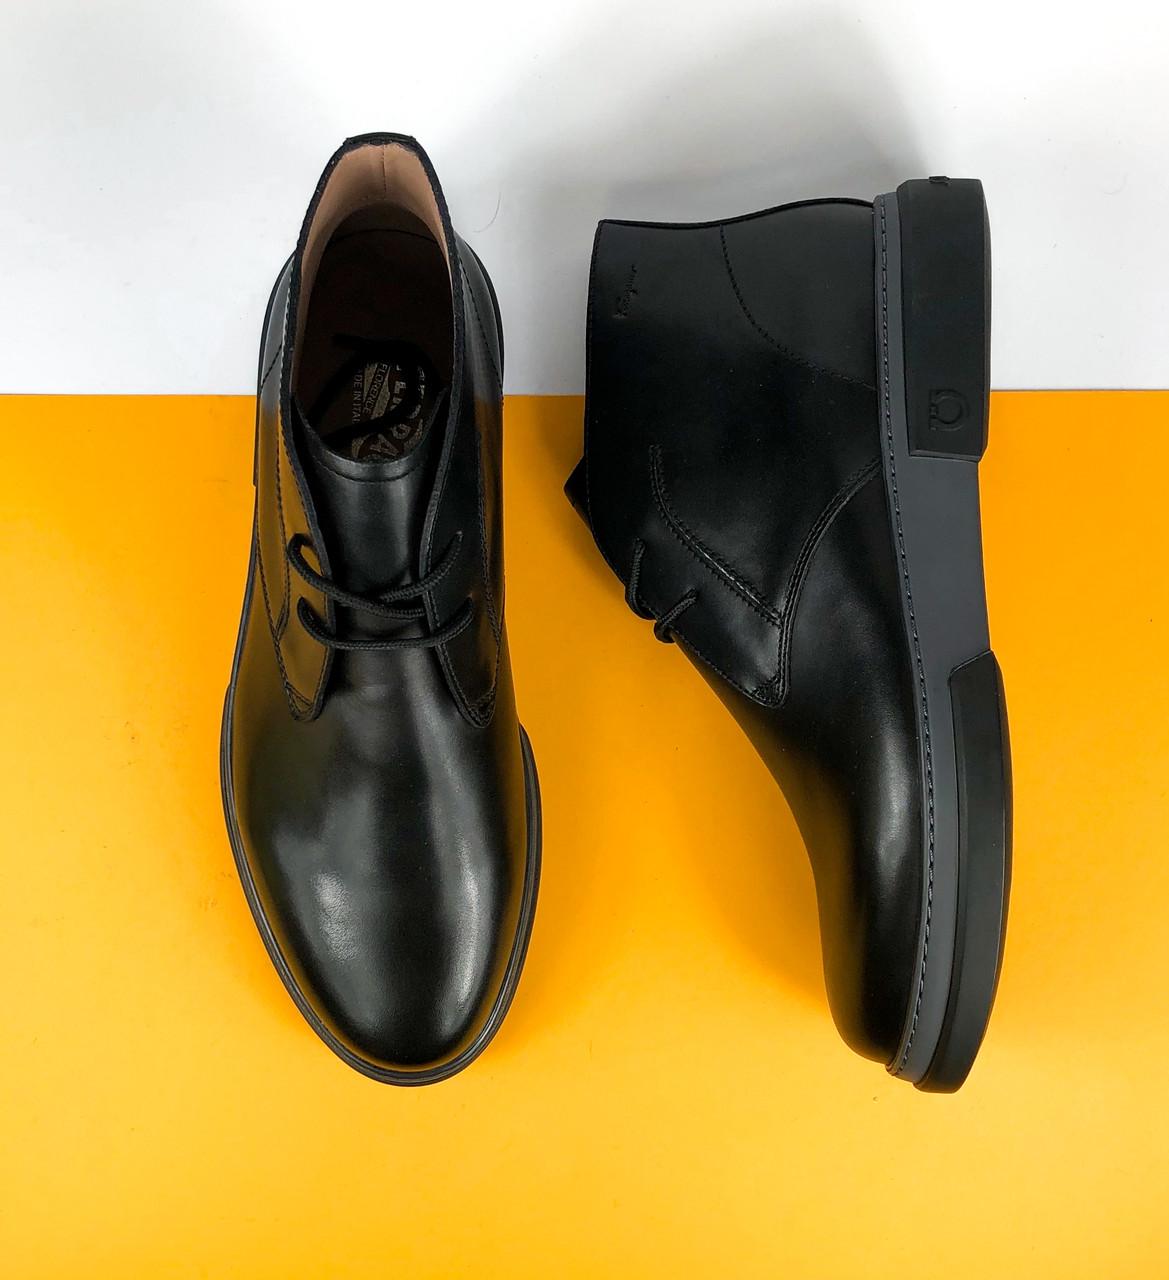 Ботинки мужские Salvatore Ferragamo (Сальваторе Феррагамо) арт. 59-23